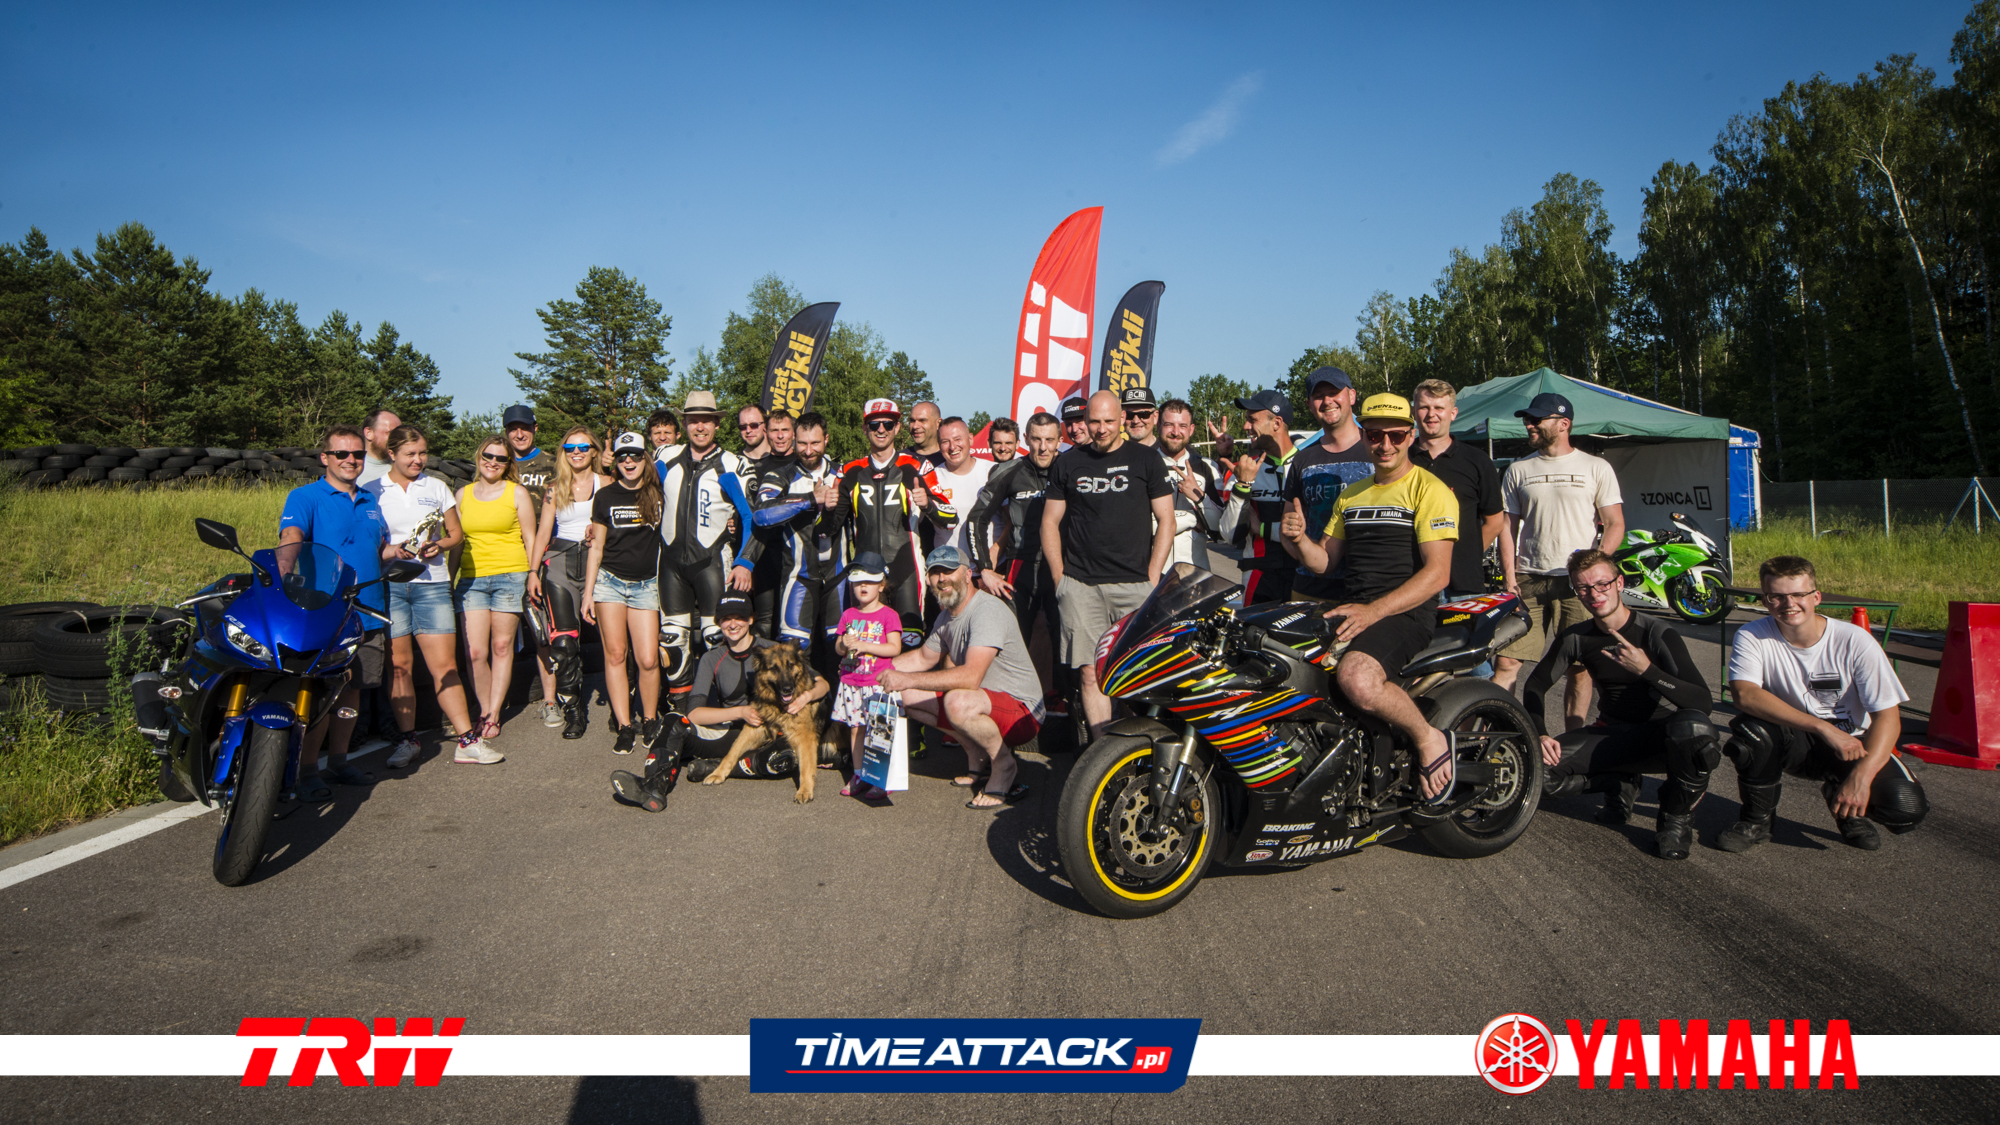 http://sklep.swiatmotocykli.pl/kategoria/time-attack/19-07-autodrom-pomorze-time-attack